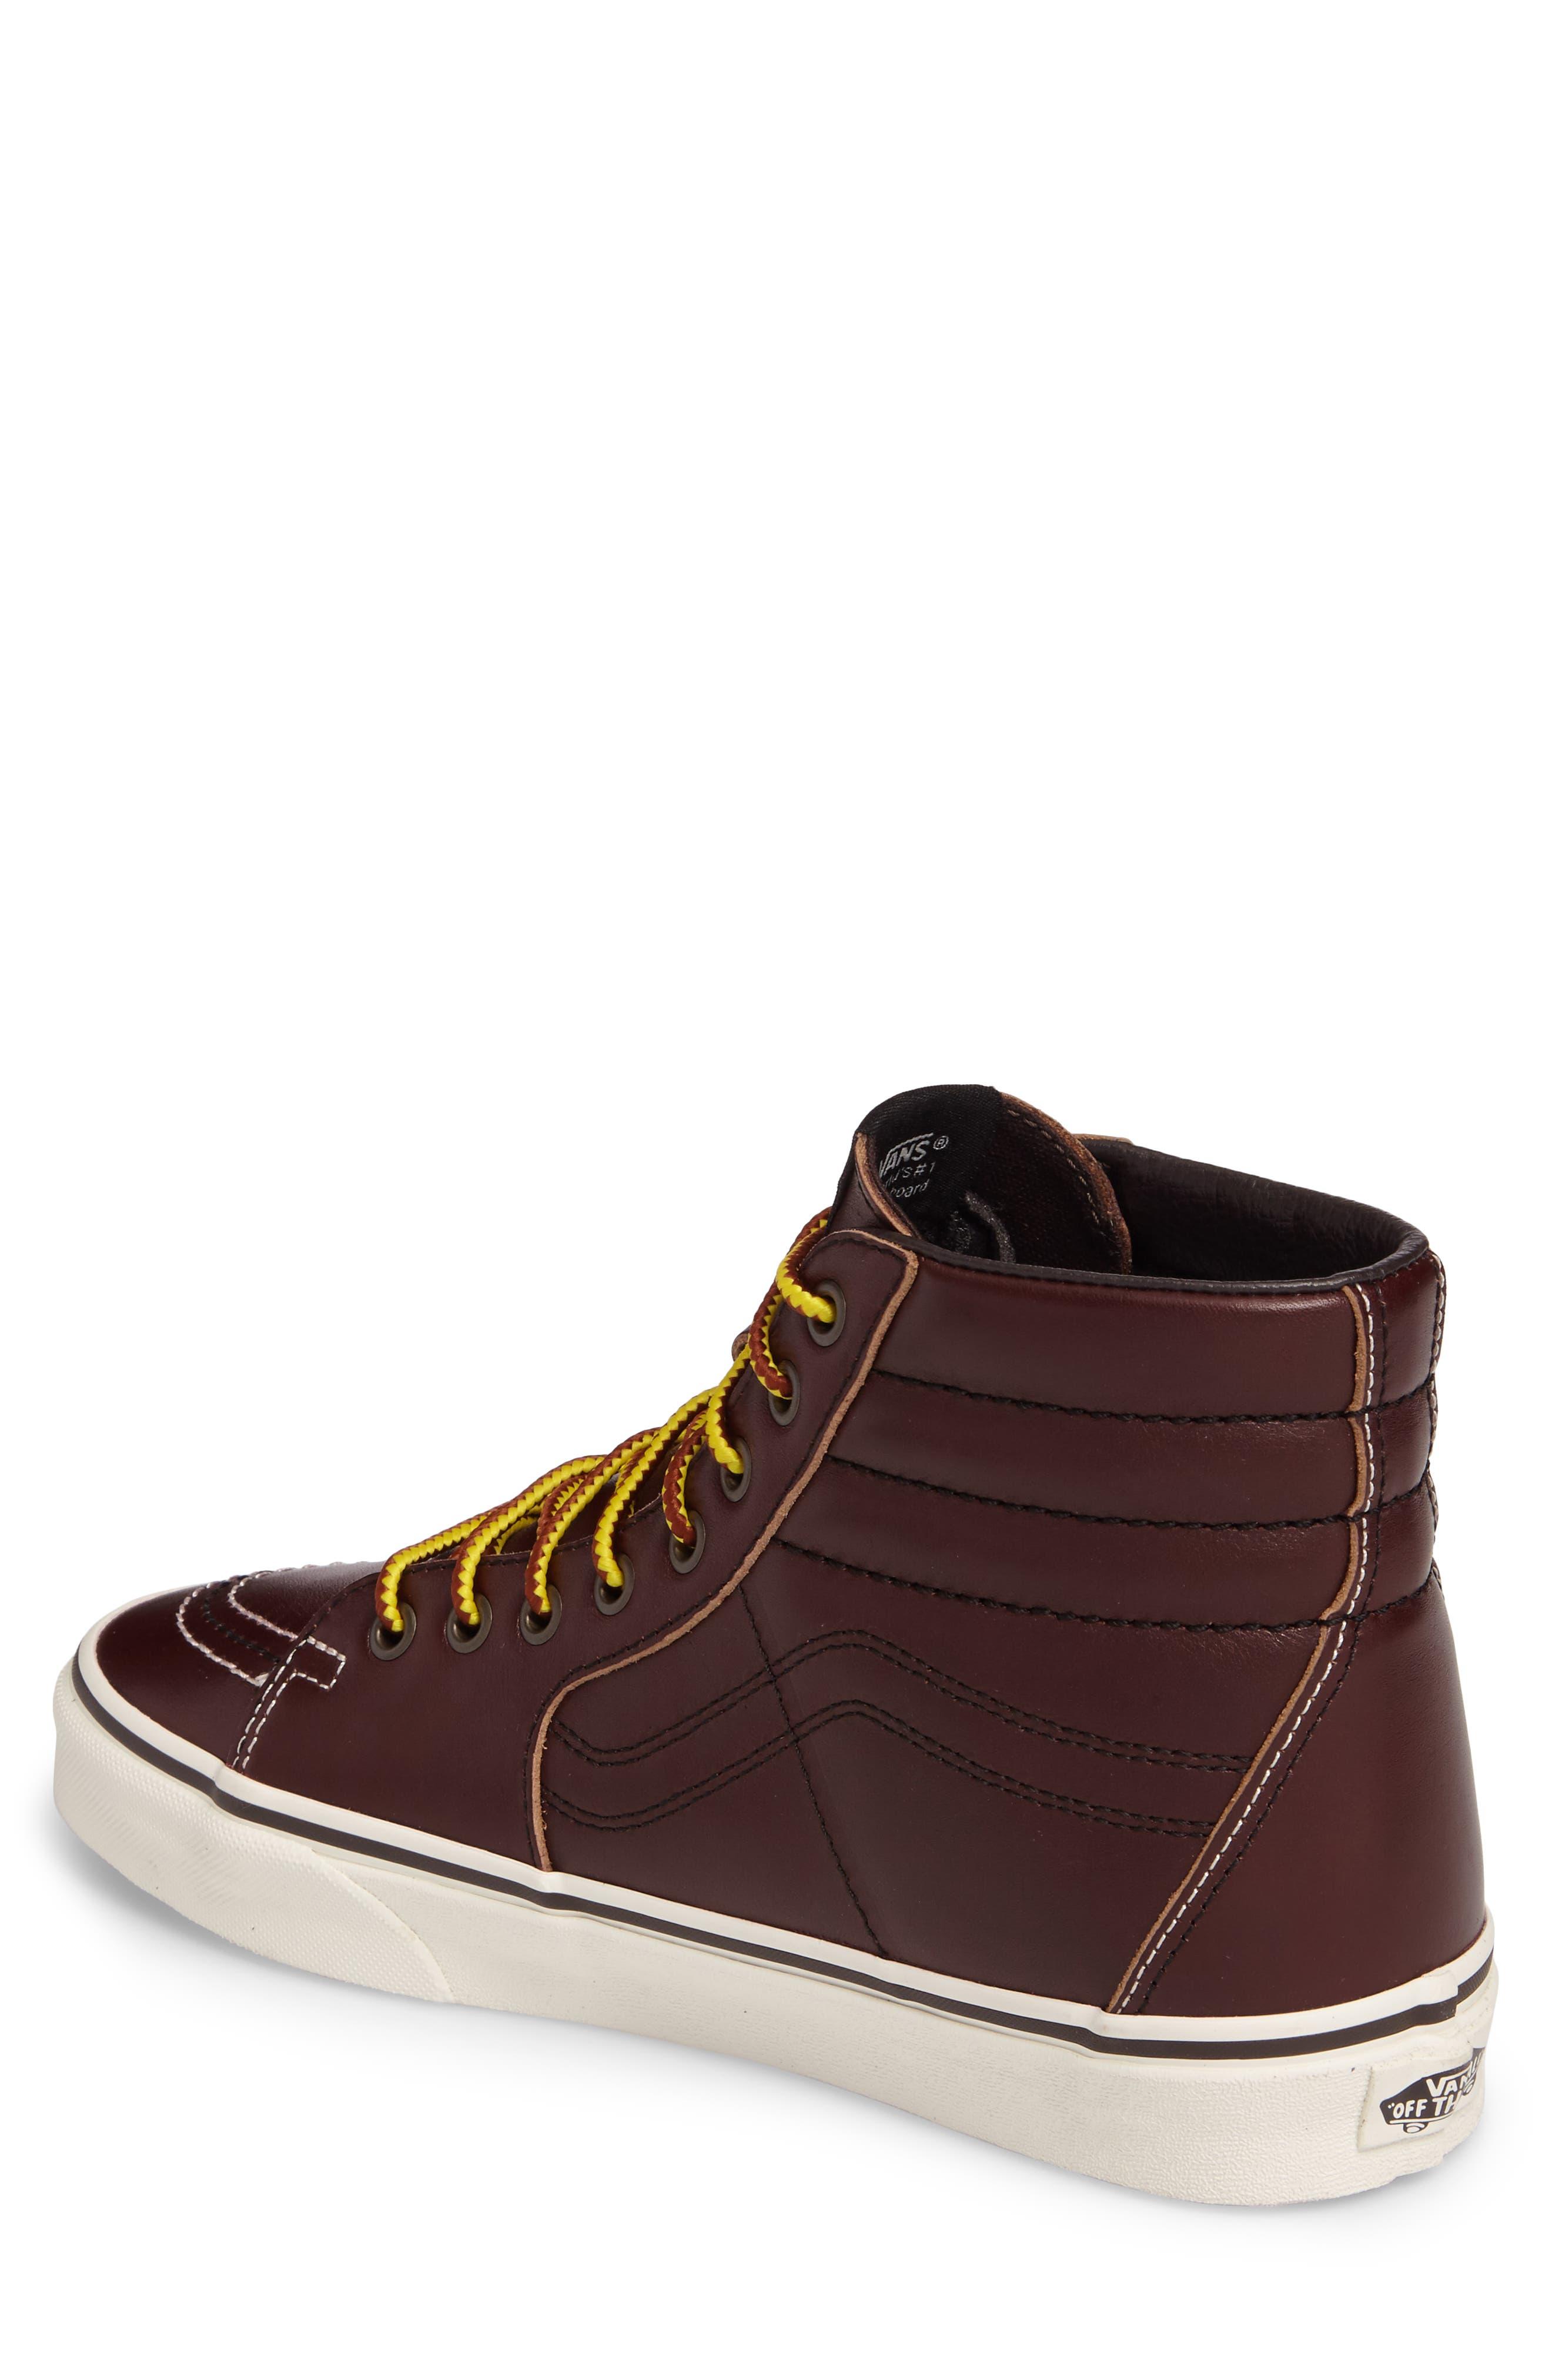 Alternate Image 2  - Vans Sk8-Hi Sneaker (Men)